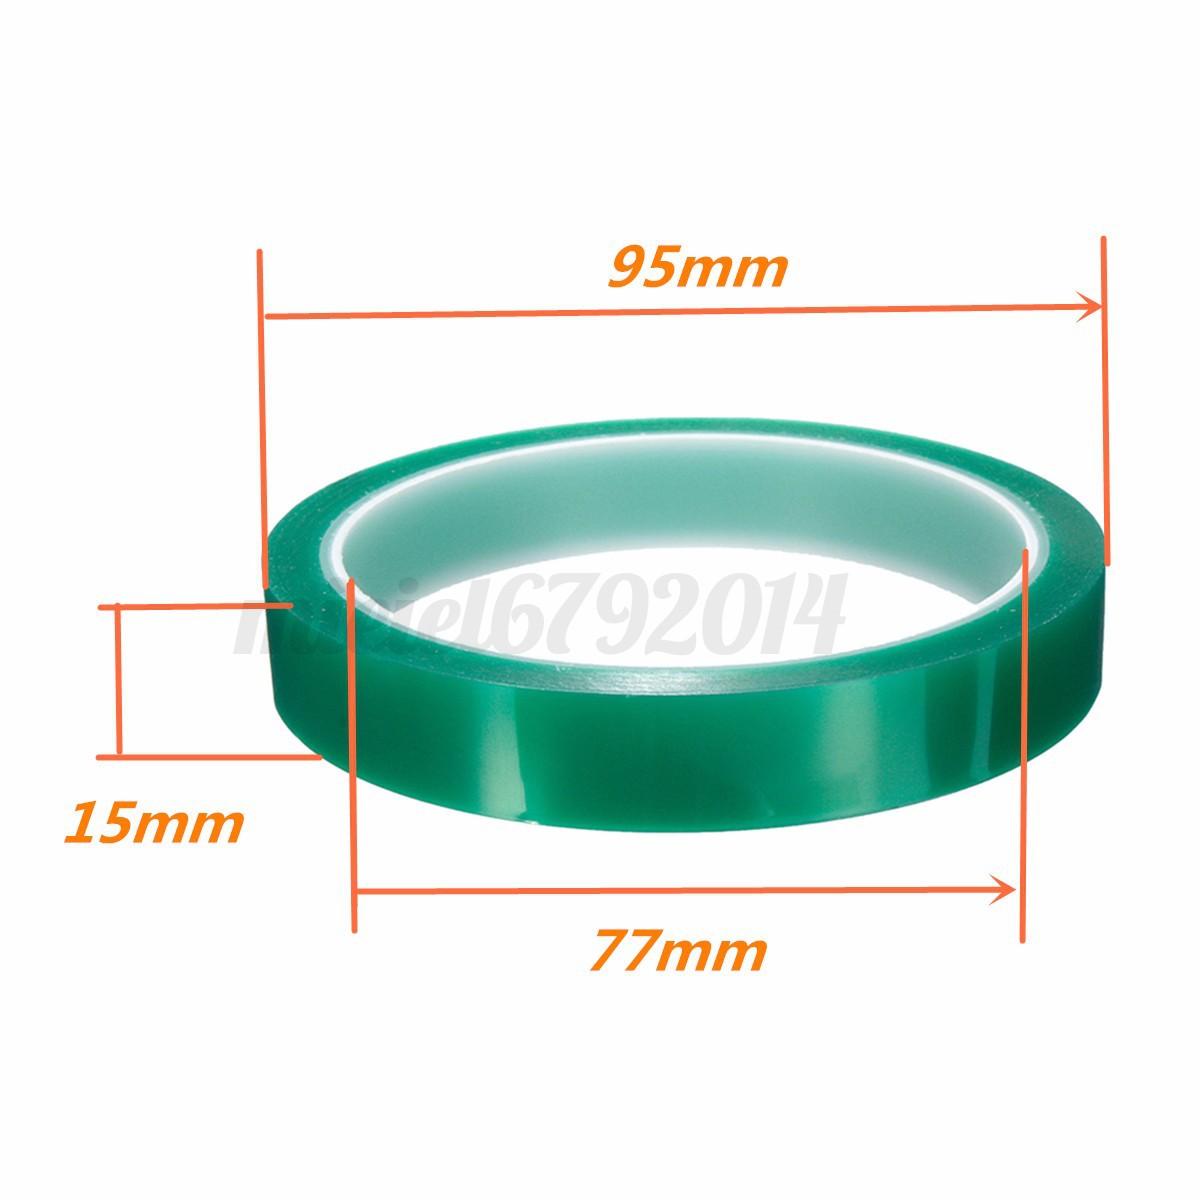 33m polyimid tape hitzebest ndiges klebeband polyimide folie 3d drucker 350 c t2. Black Bedroom Furniture Sets. Home Design Ideas